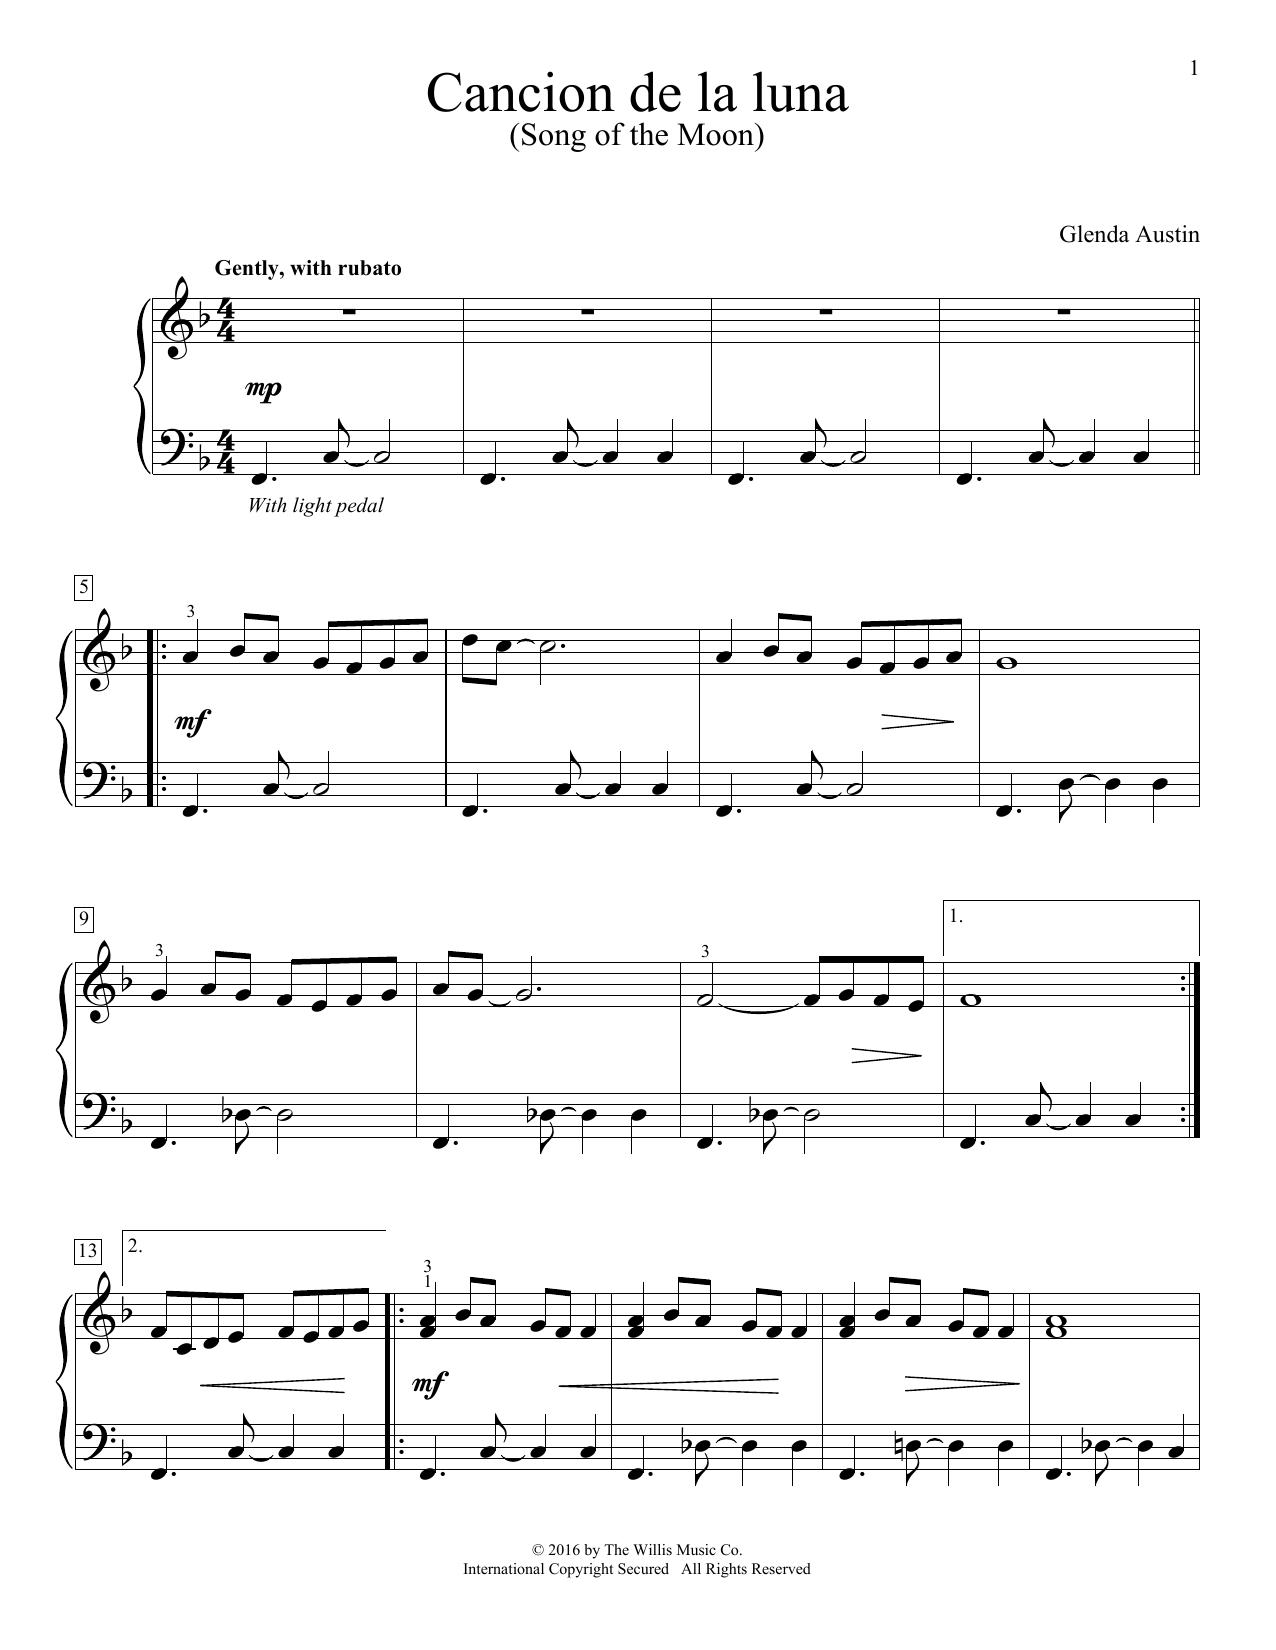 Glenda Austin - Cancion De La Luna